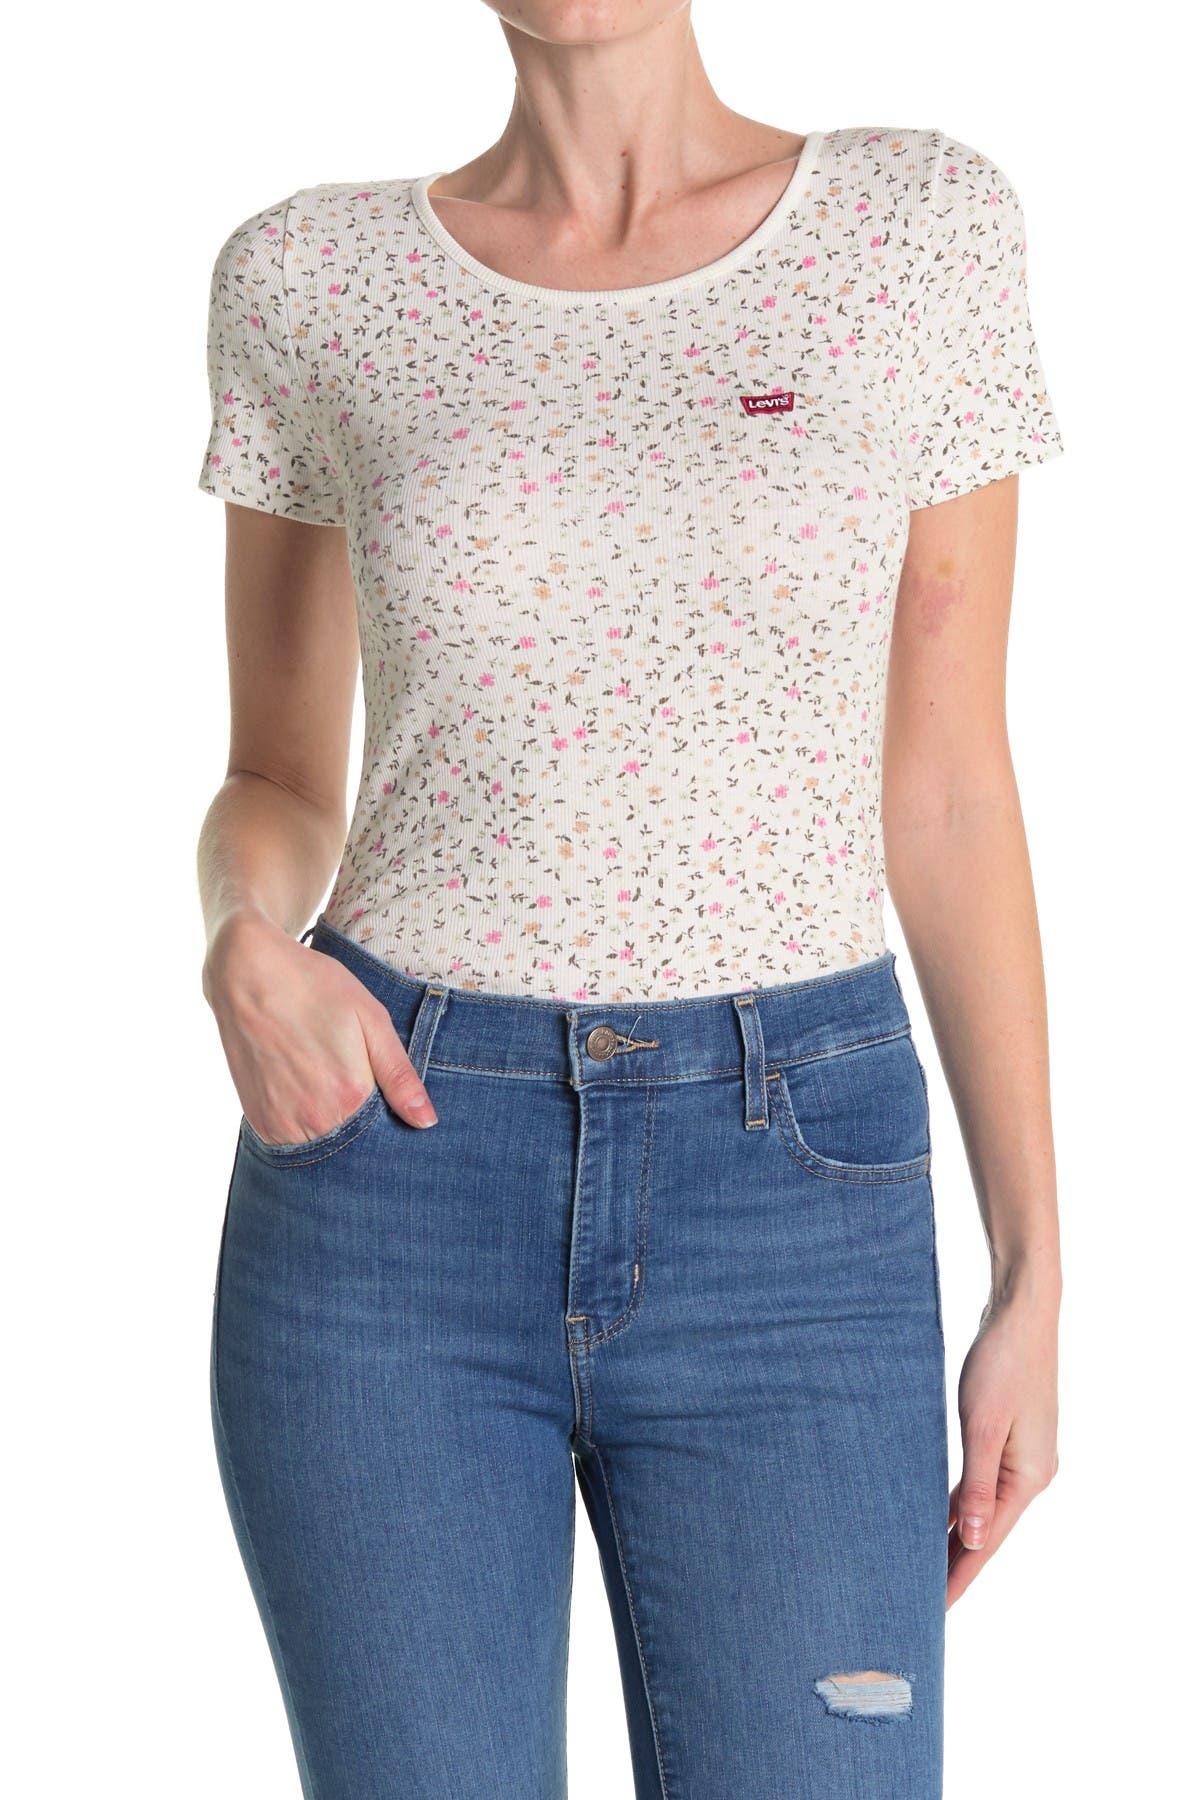 Image of Levi's Honey Floral Scoop Neck T-Shirt